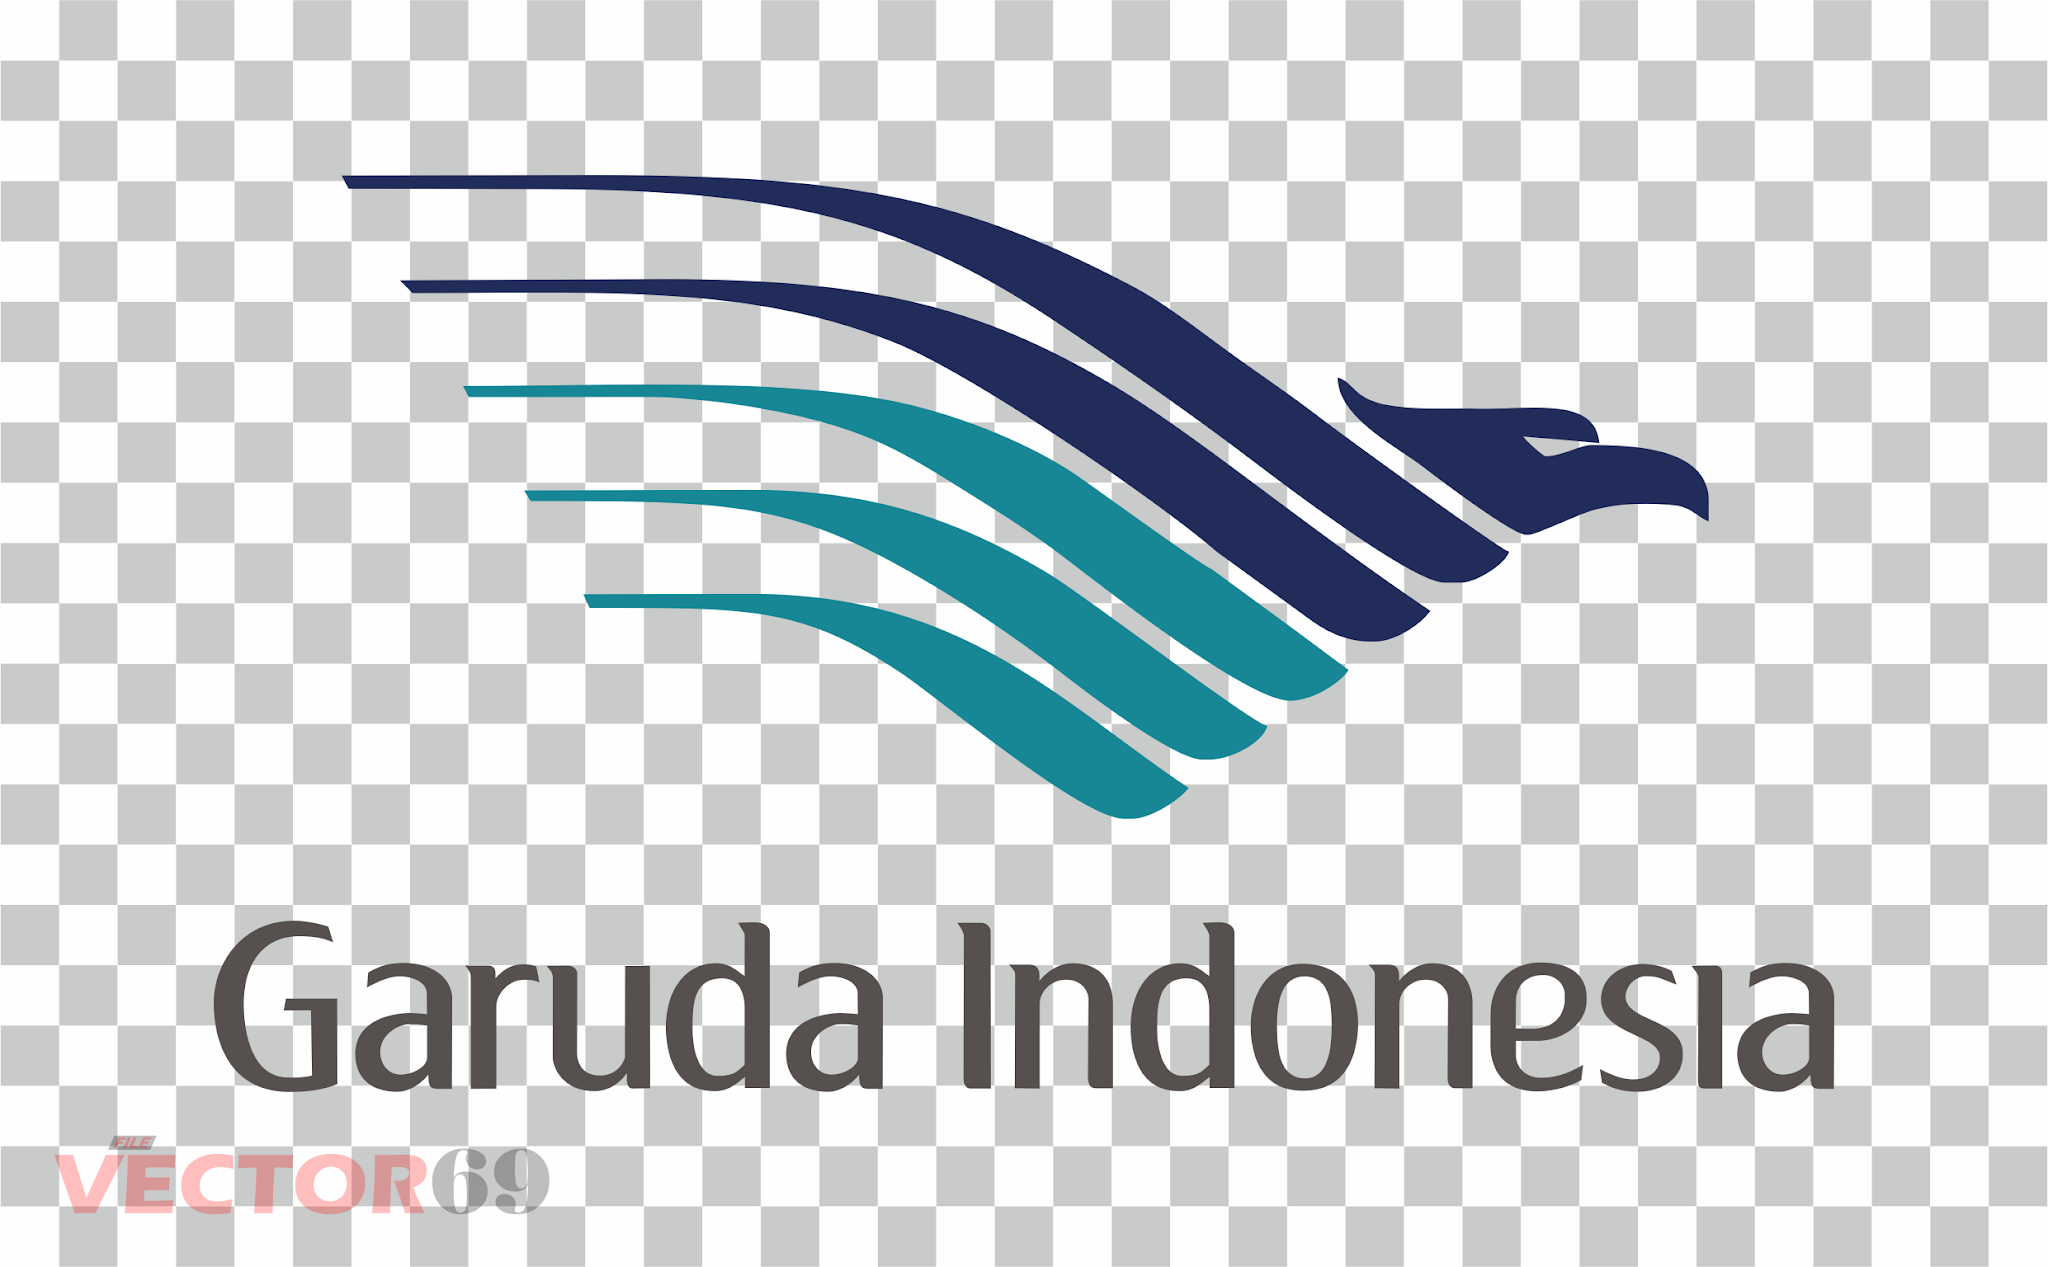 Garuda Indonesia Logo - Download Vector File PNG (Portable Network Graphics)